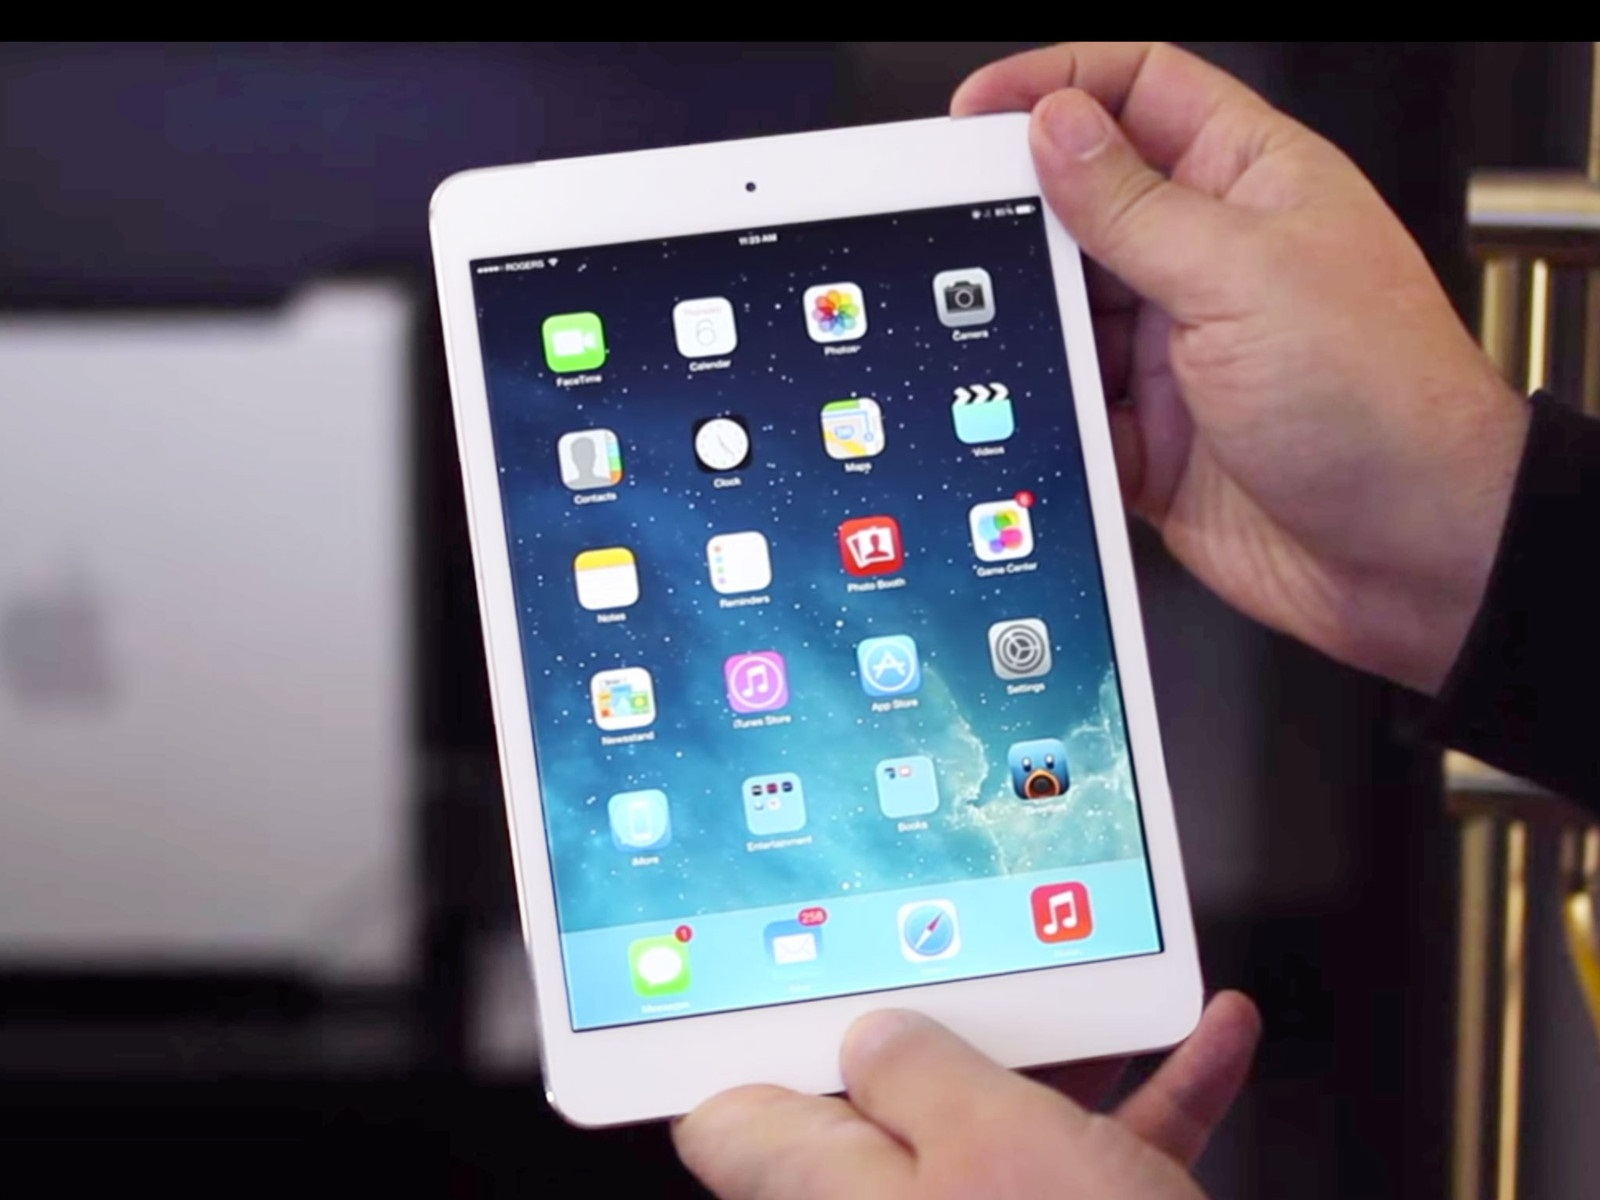 Imprime ecran dans Ipad et Iphone